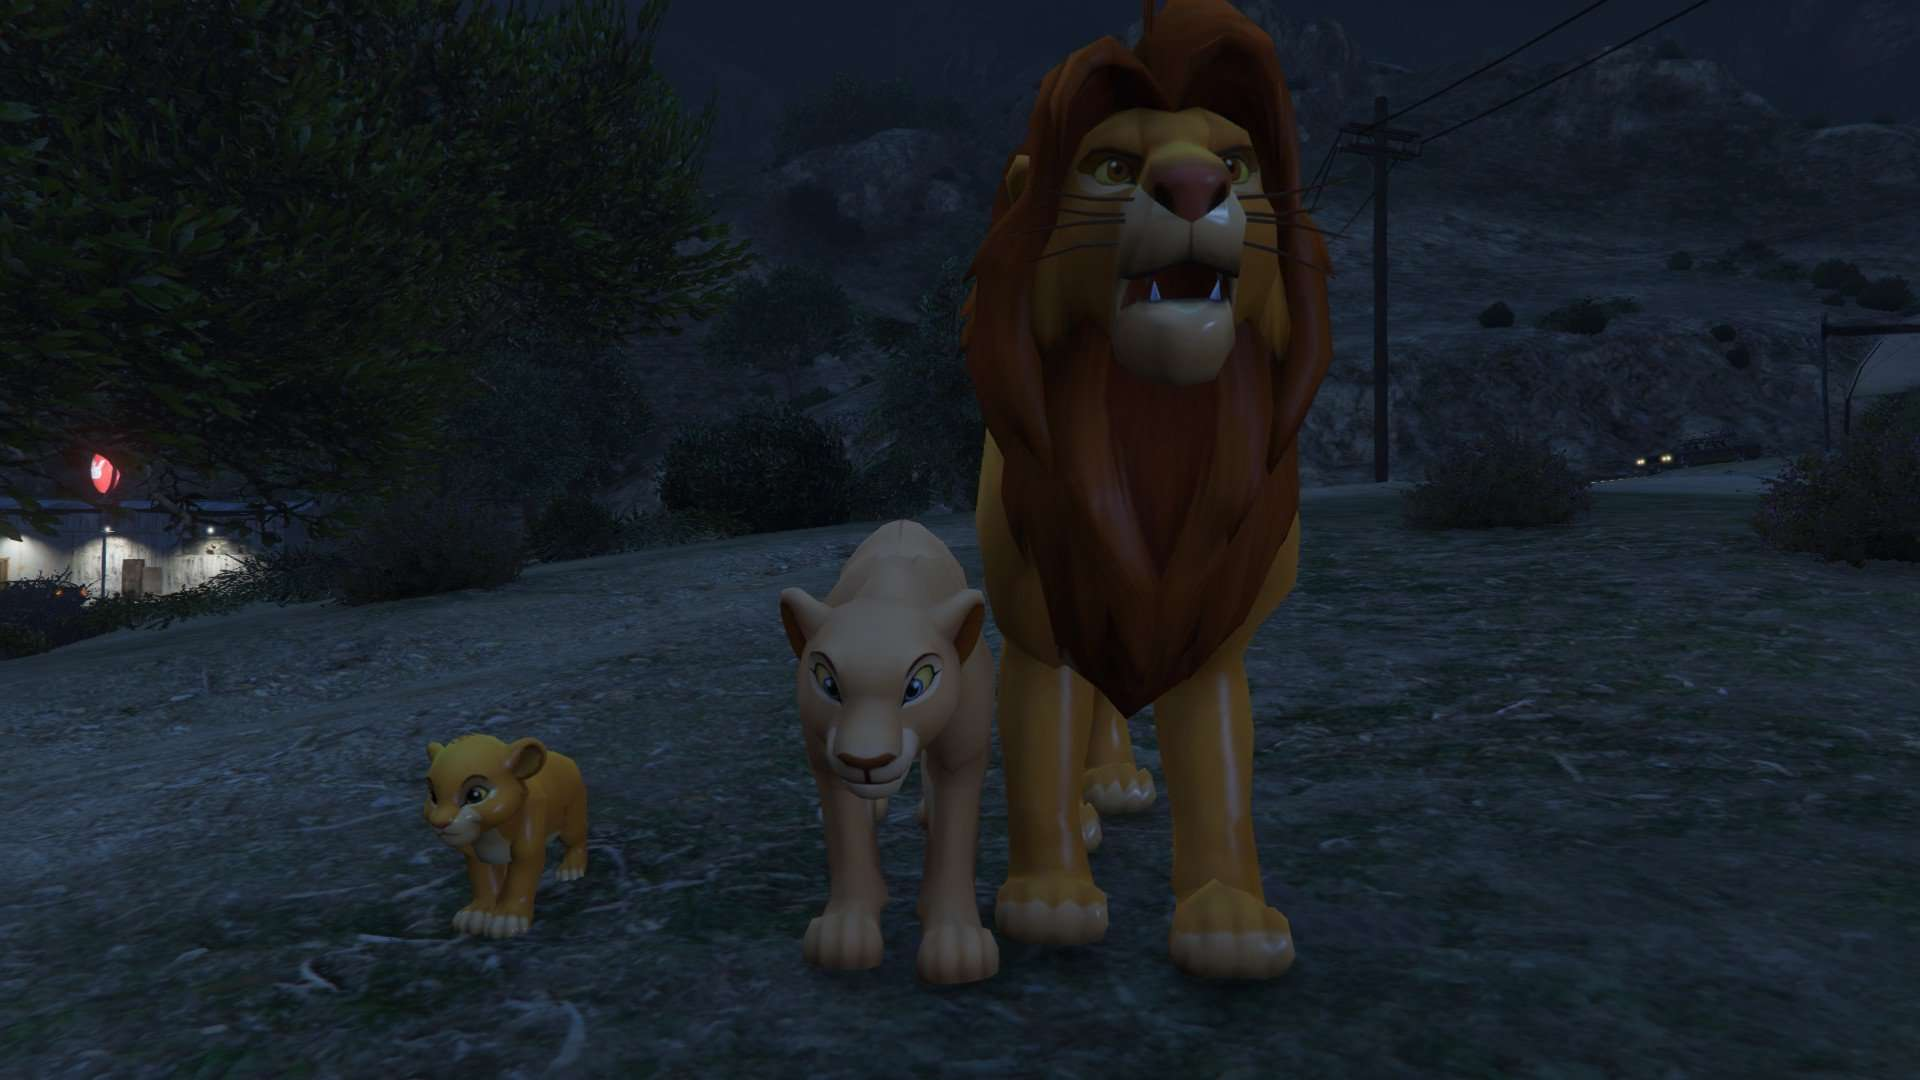 GTA 5 Meets The Lion King - GTA 5 Cheats